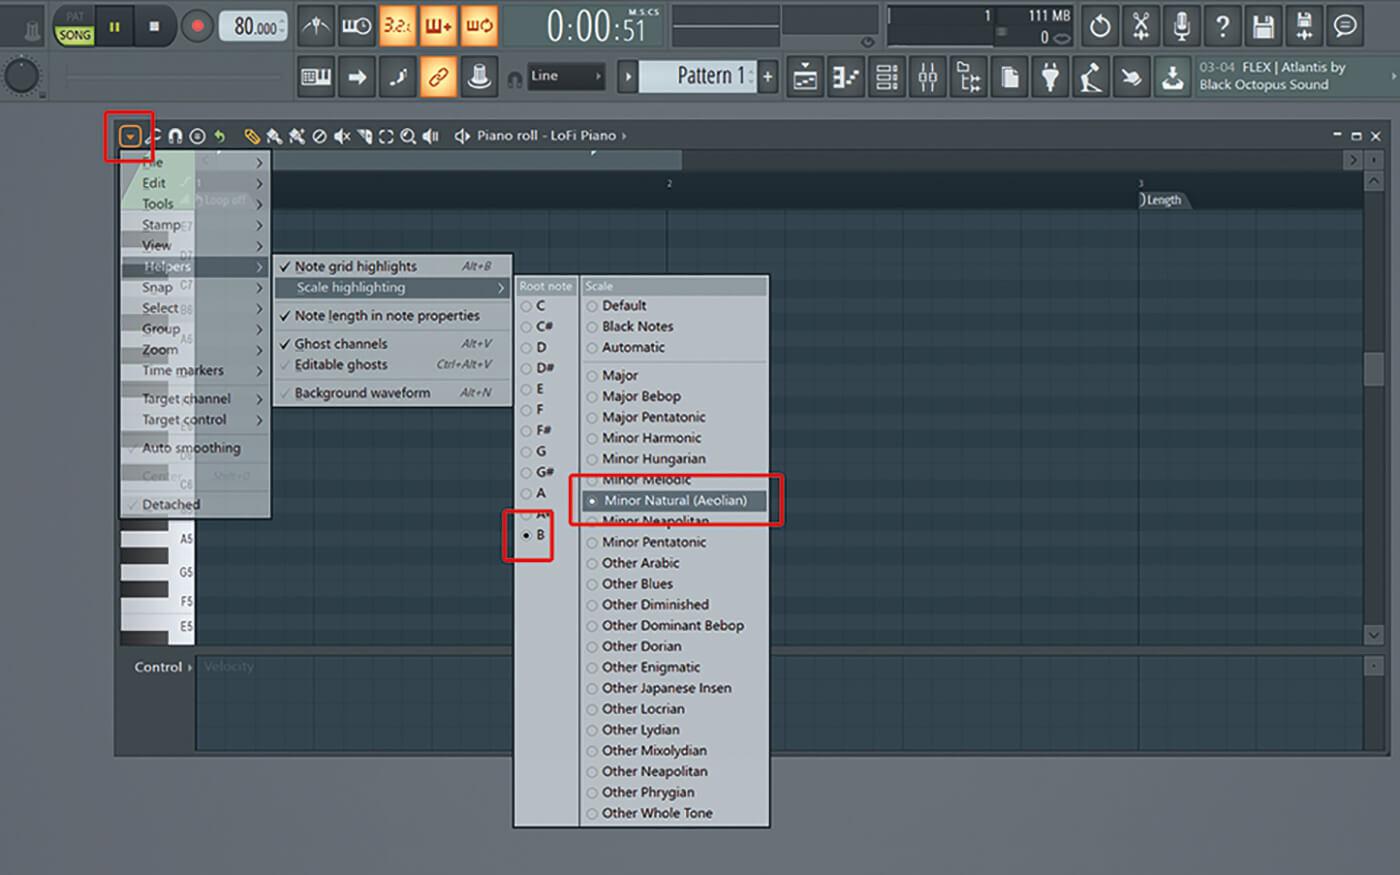 MT208 FLT Studio Lo-Fi Beats TUT 5